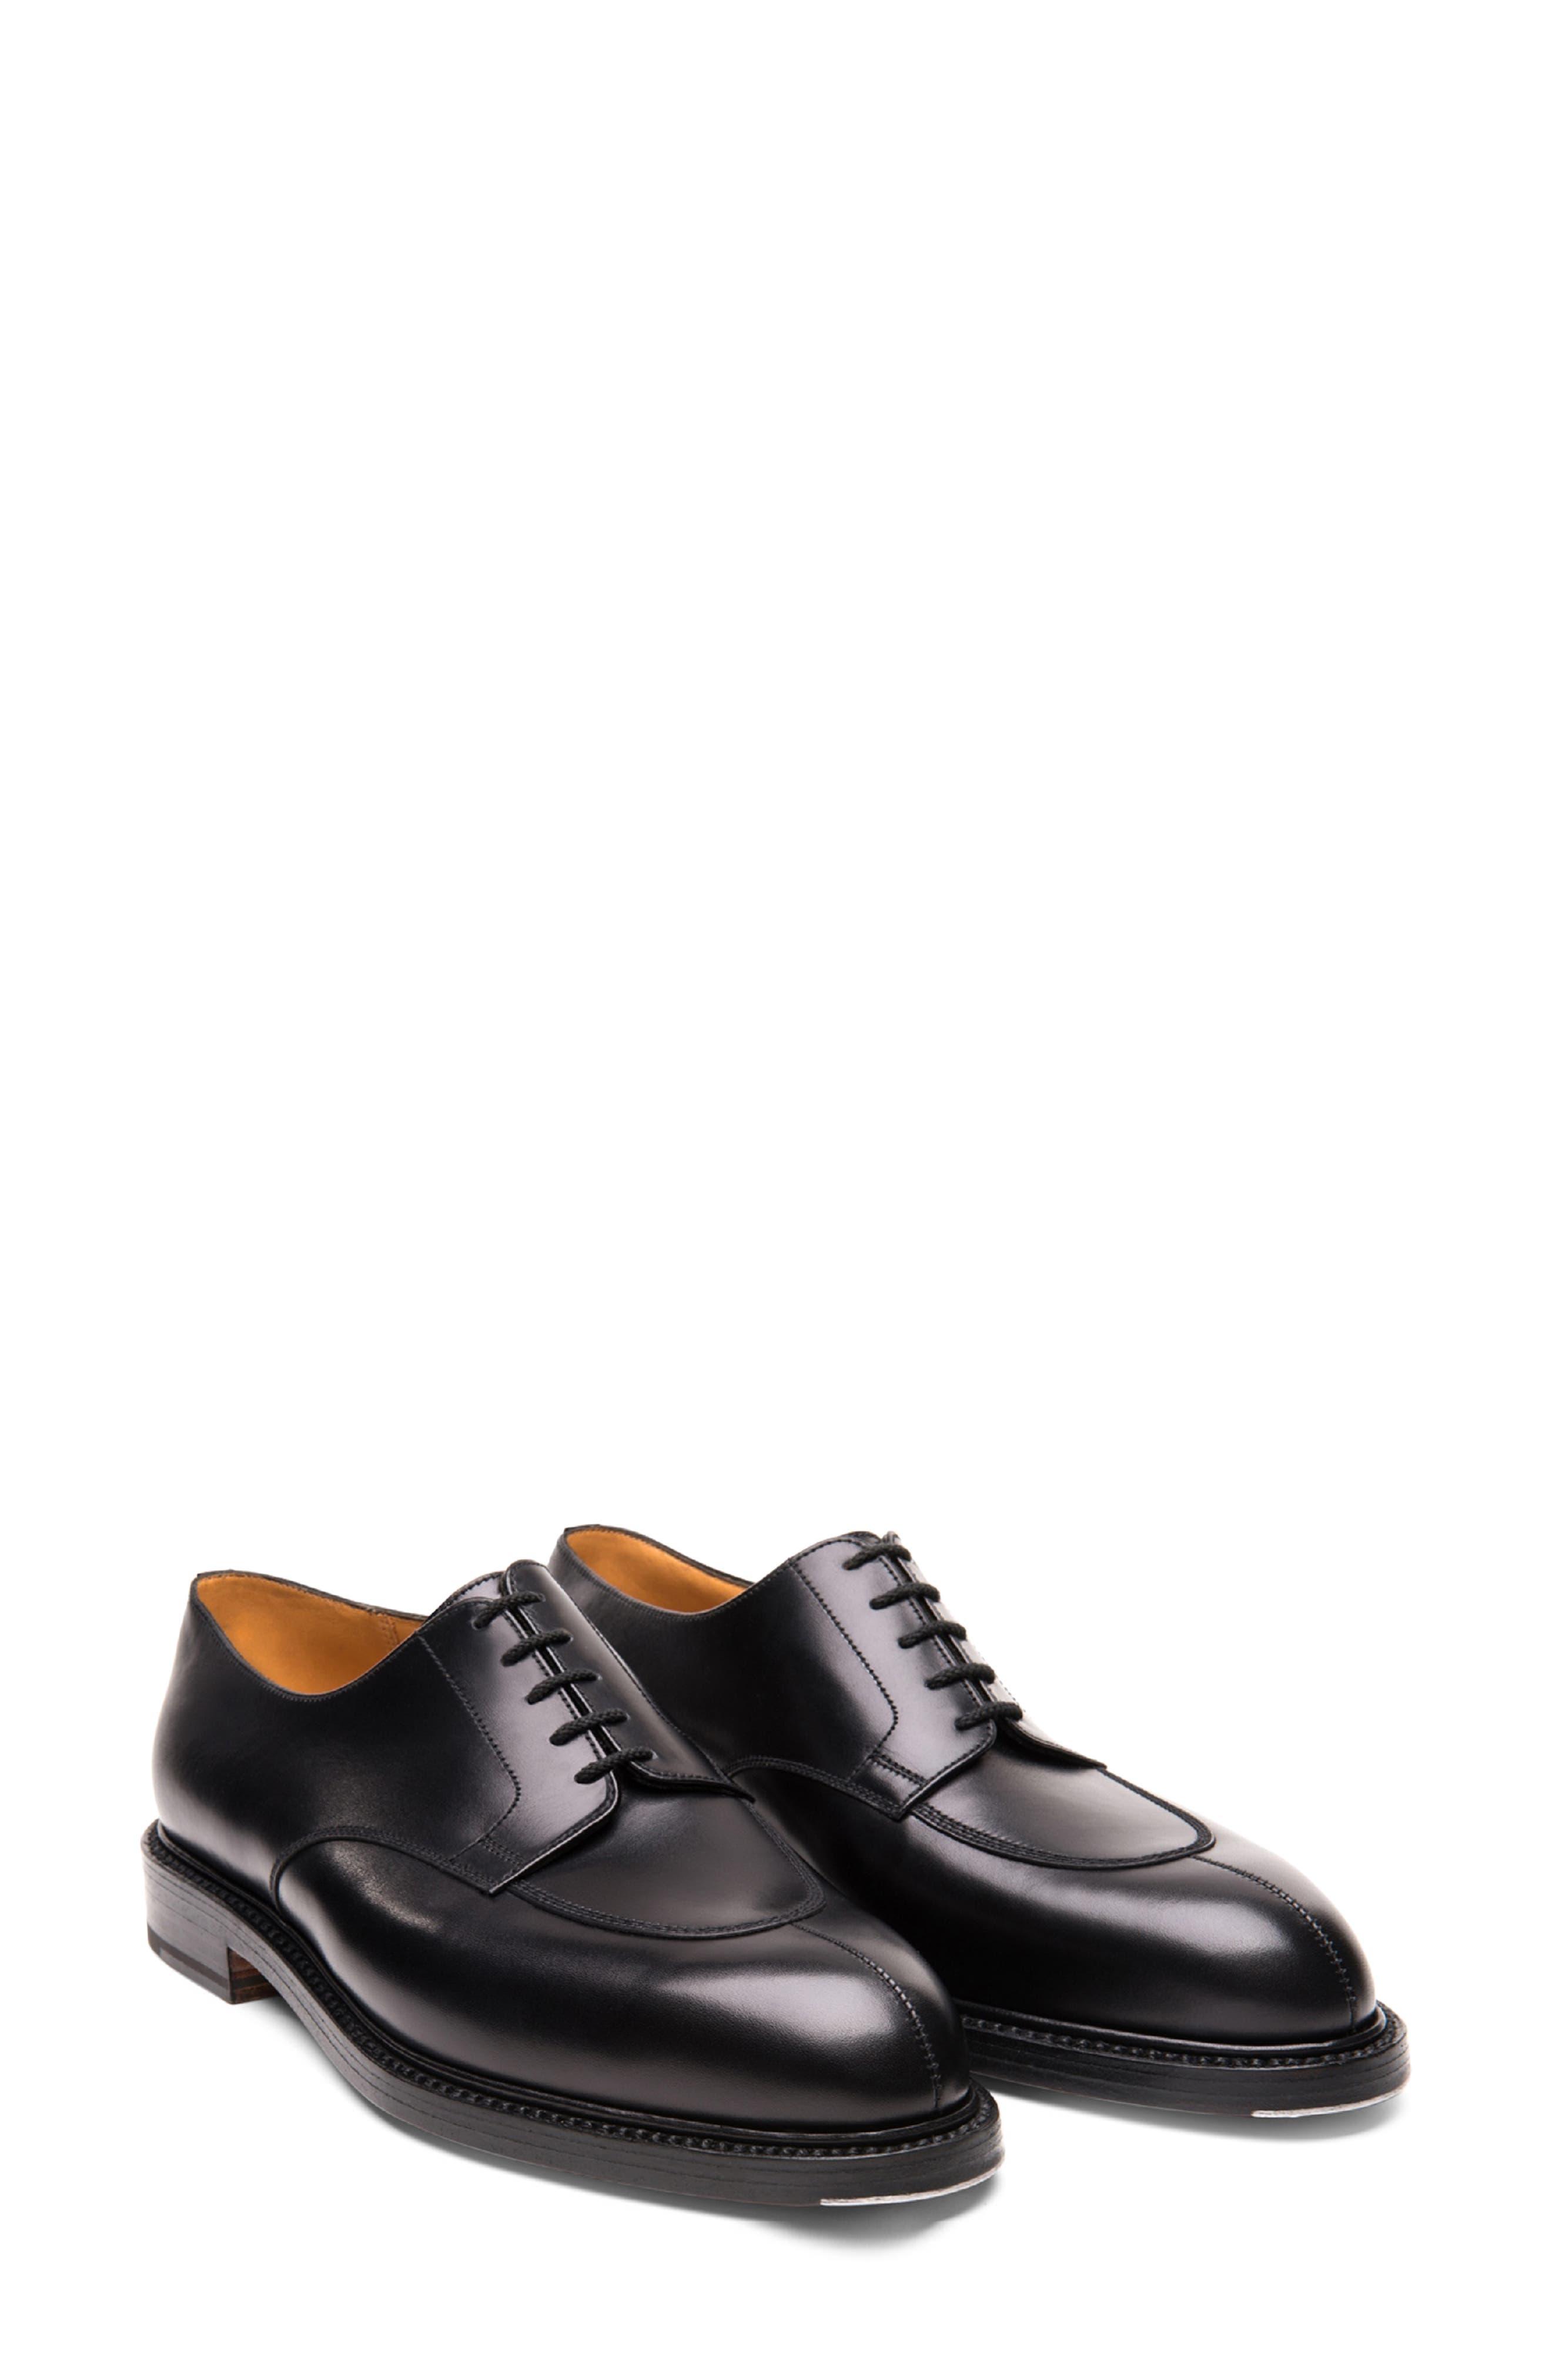 Half Hunt Oxford Shoe